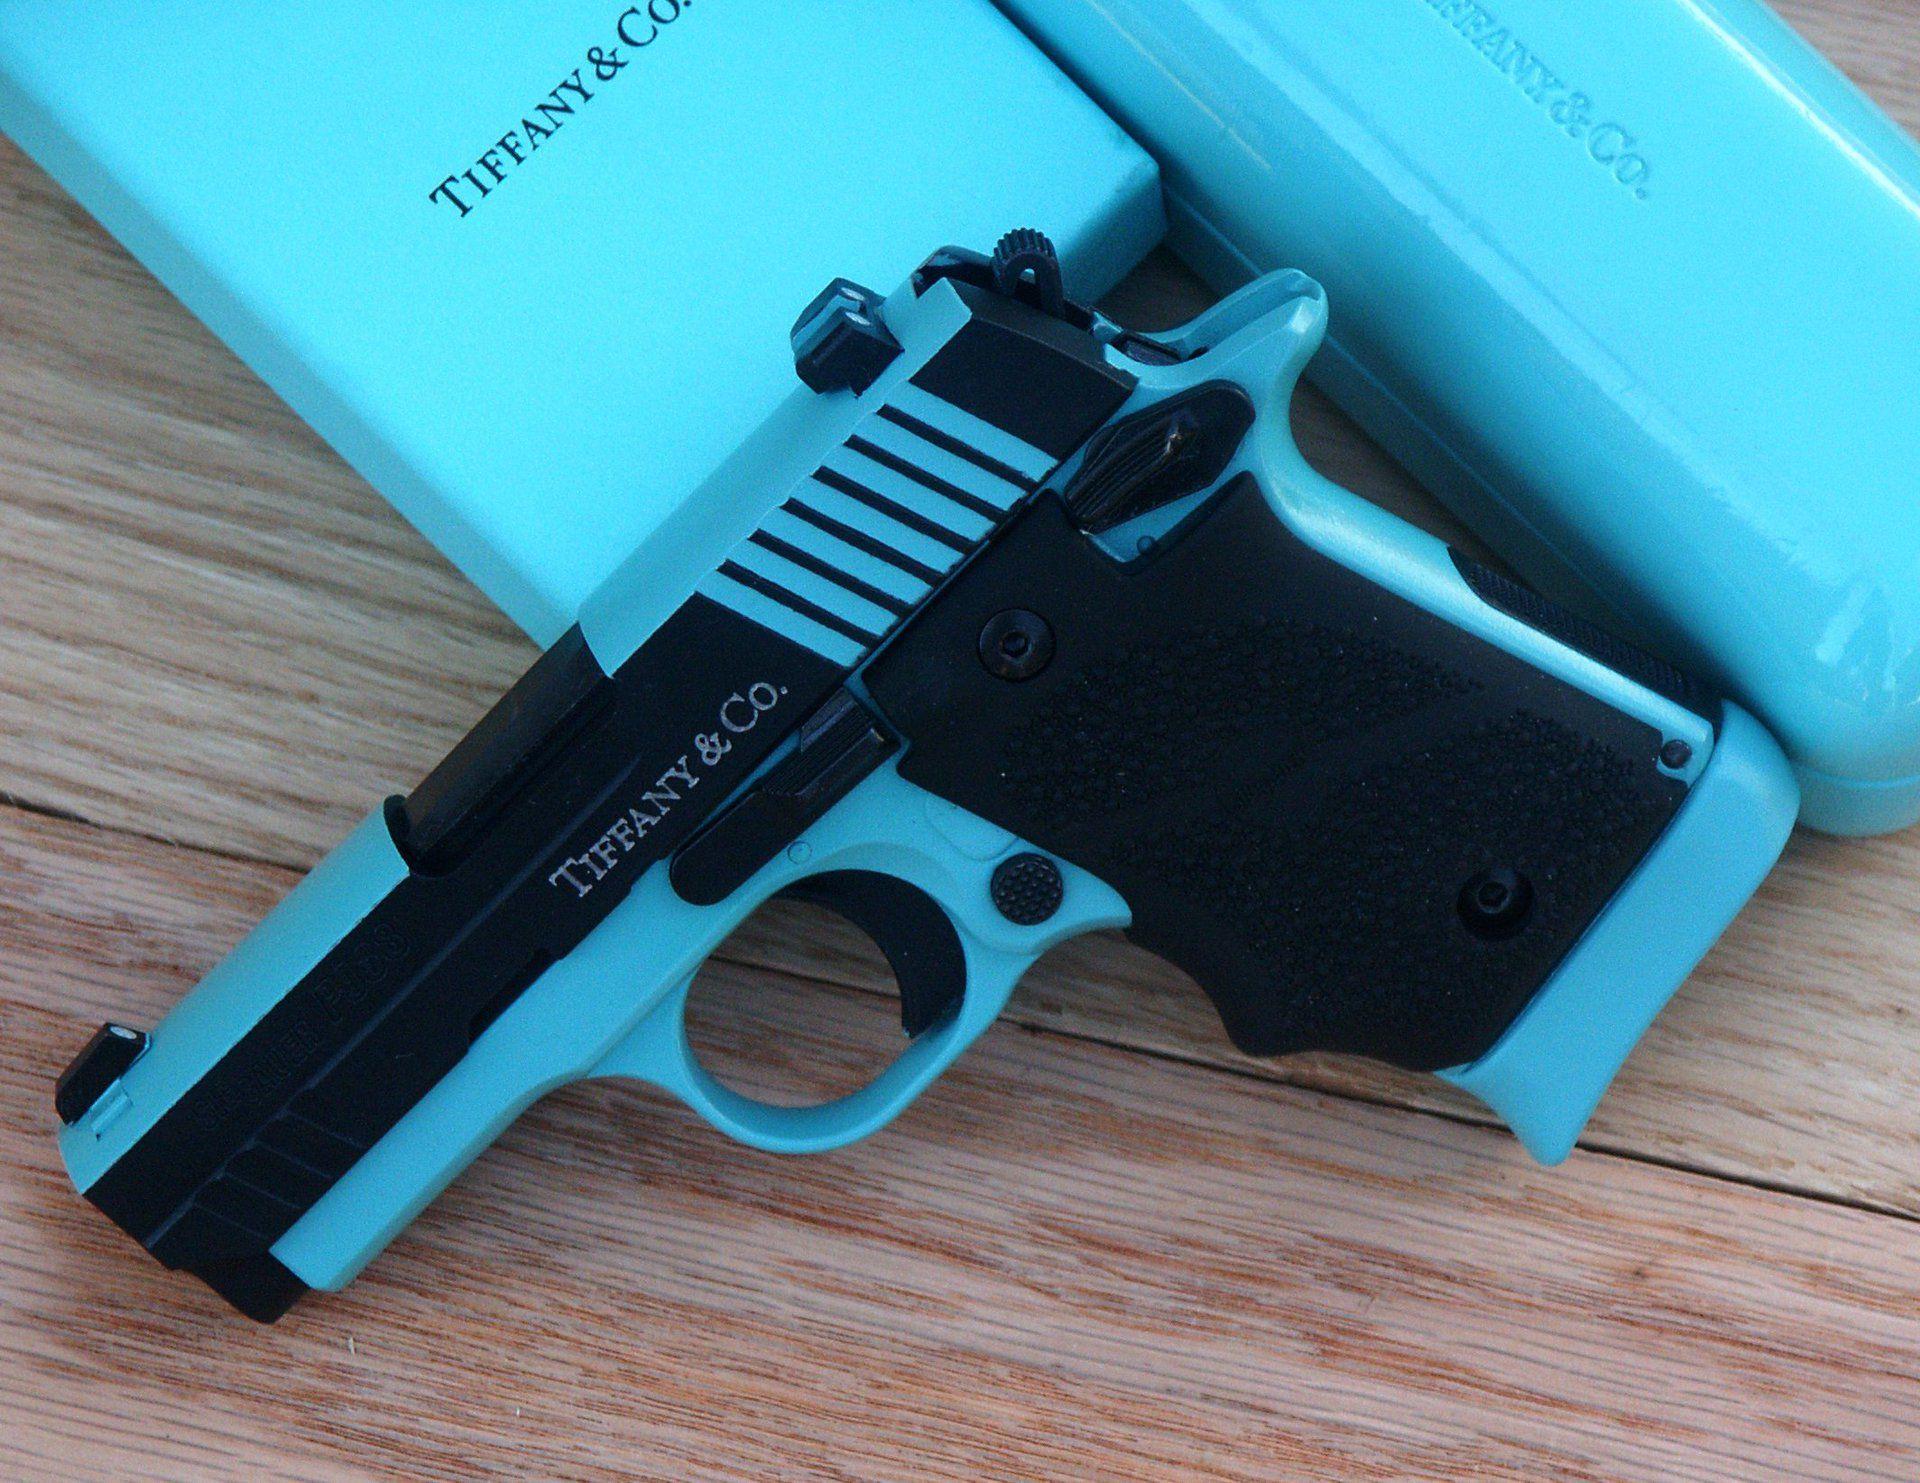 tiffany blue pistol - HD1920×1483